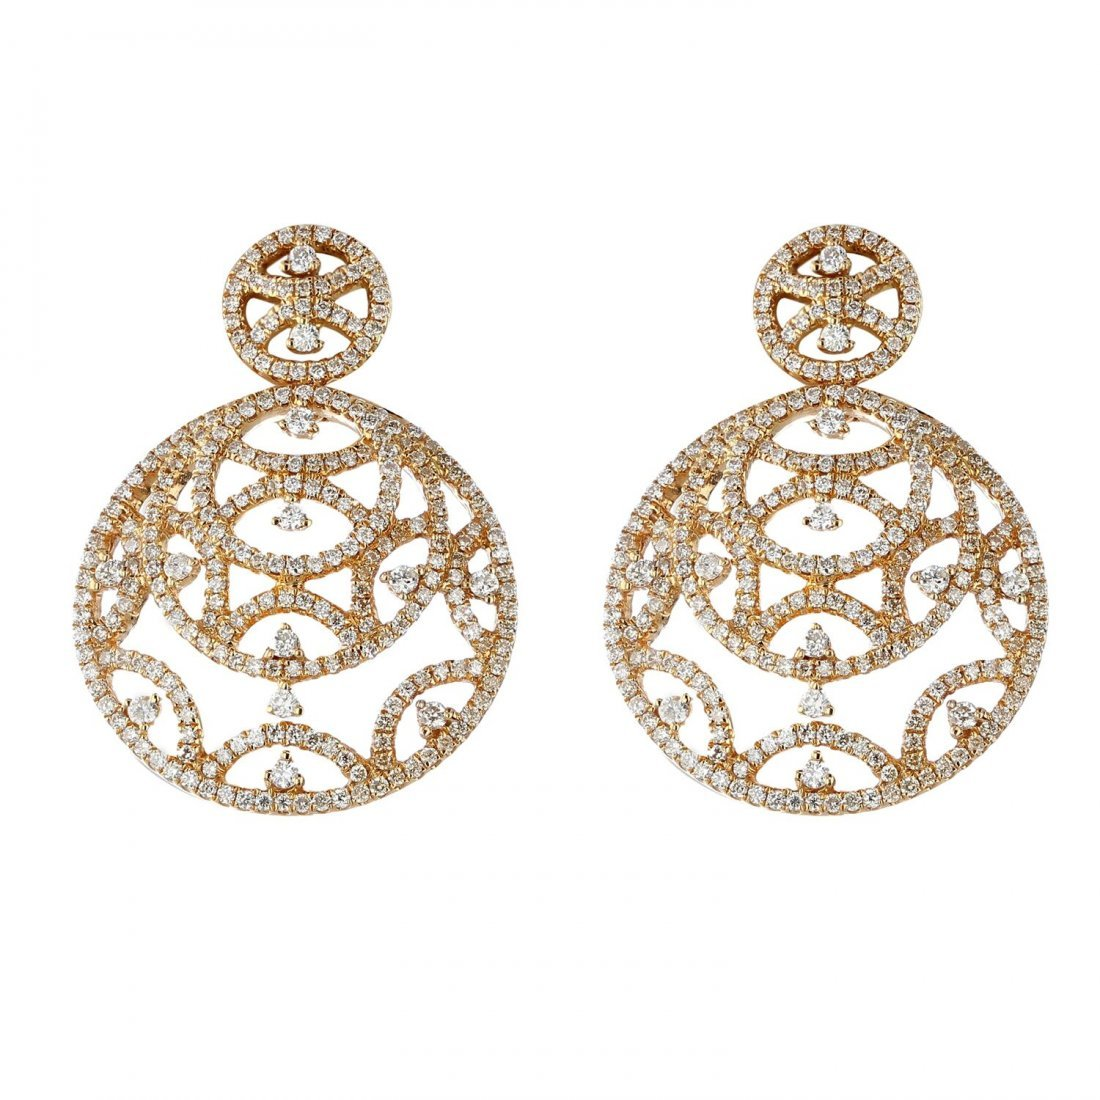 18K Gold 2.05 CT Diamond Earrings